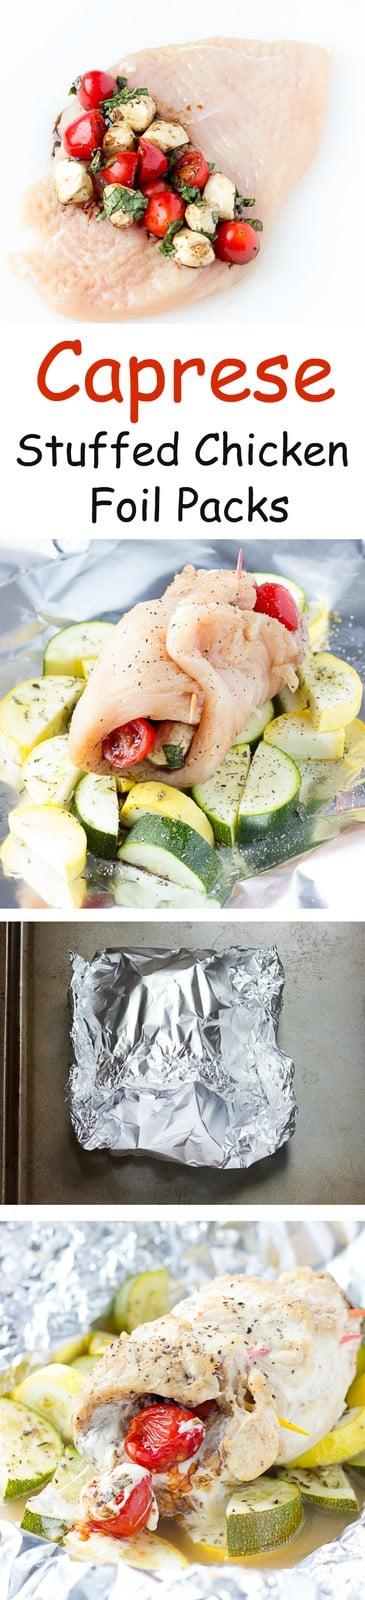 Caprese Stuffed Chicken Foil Packs